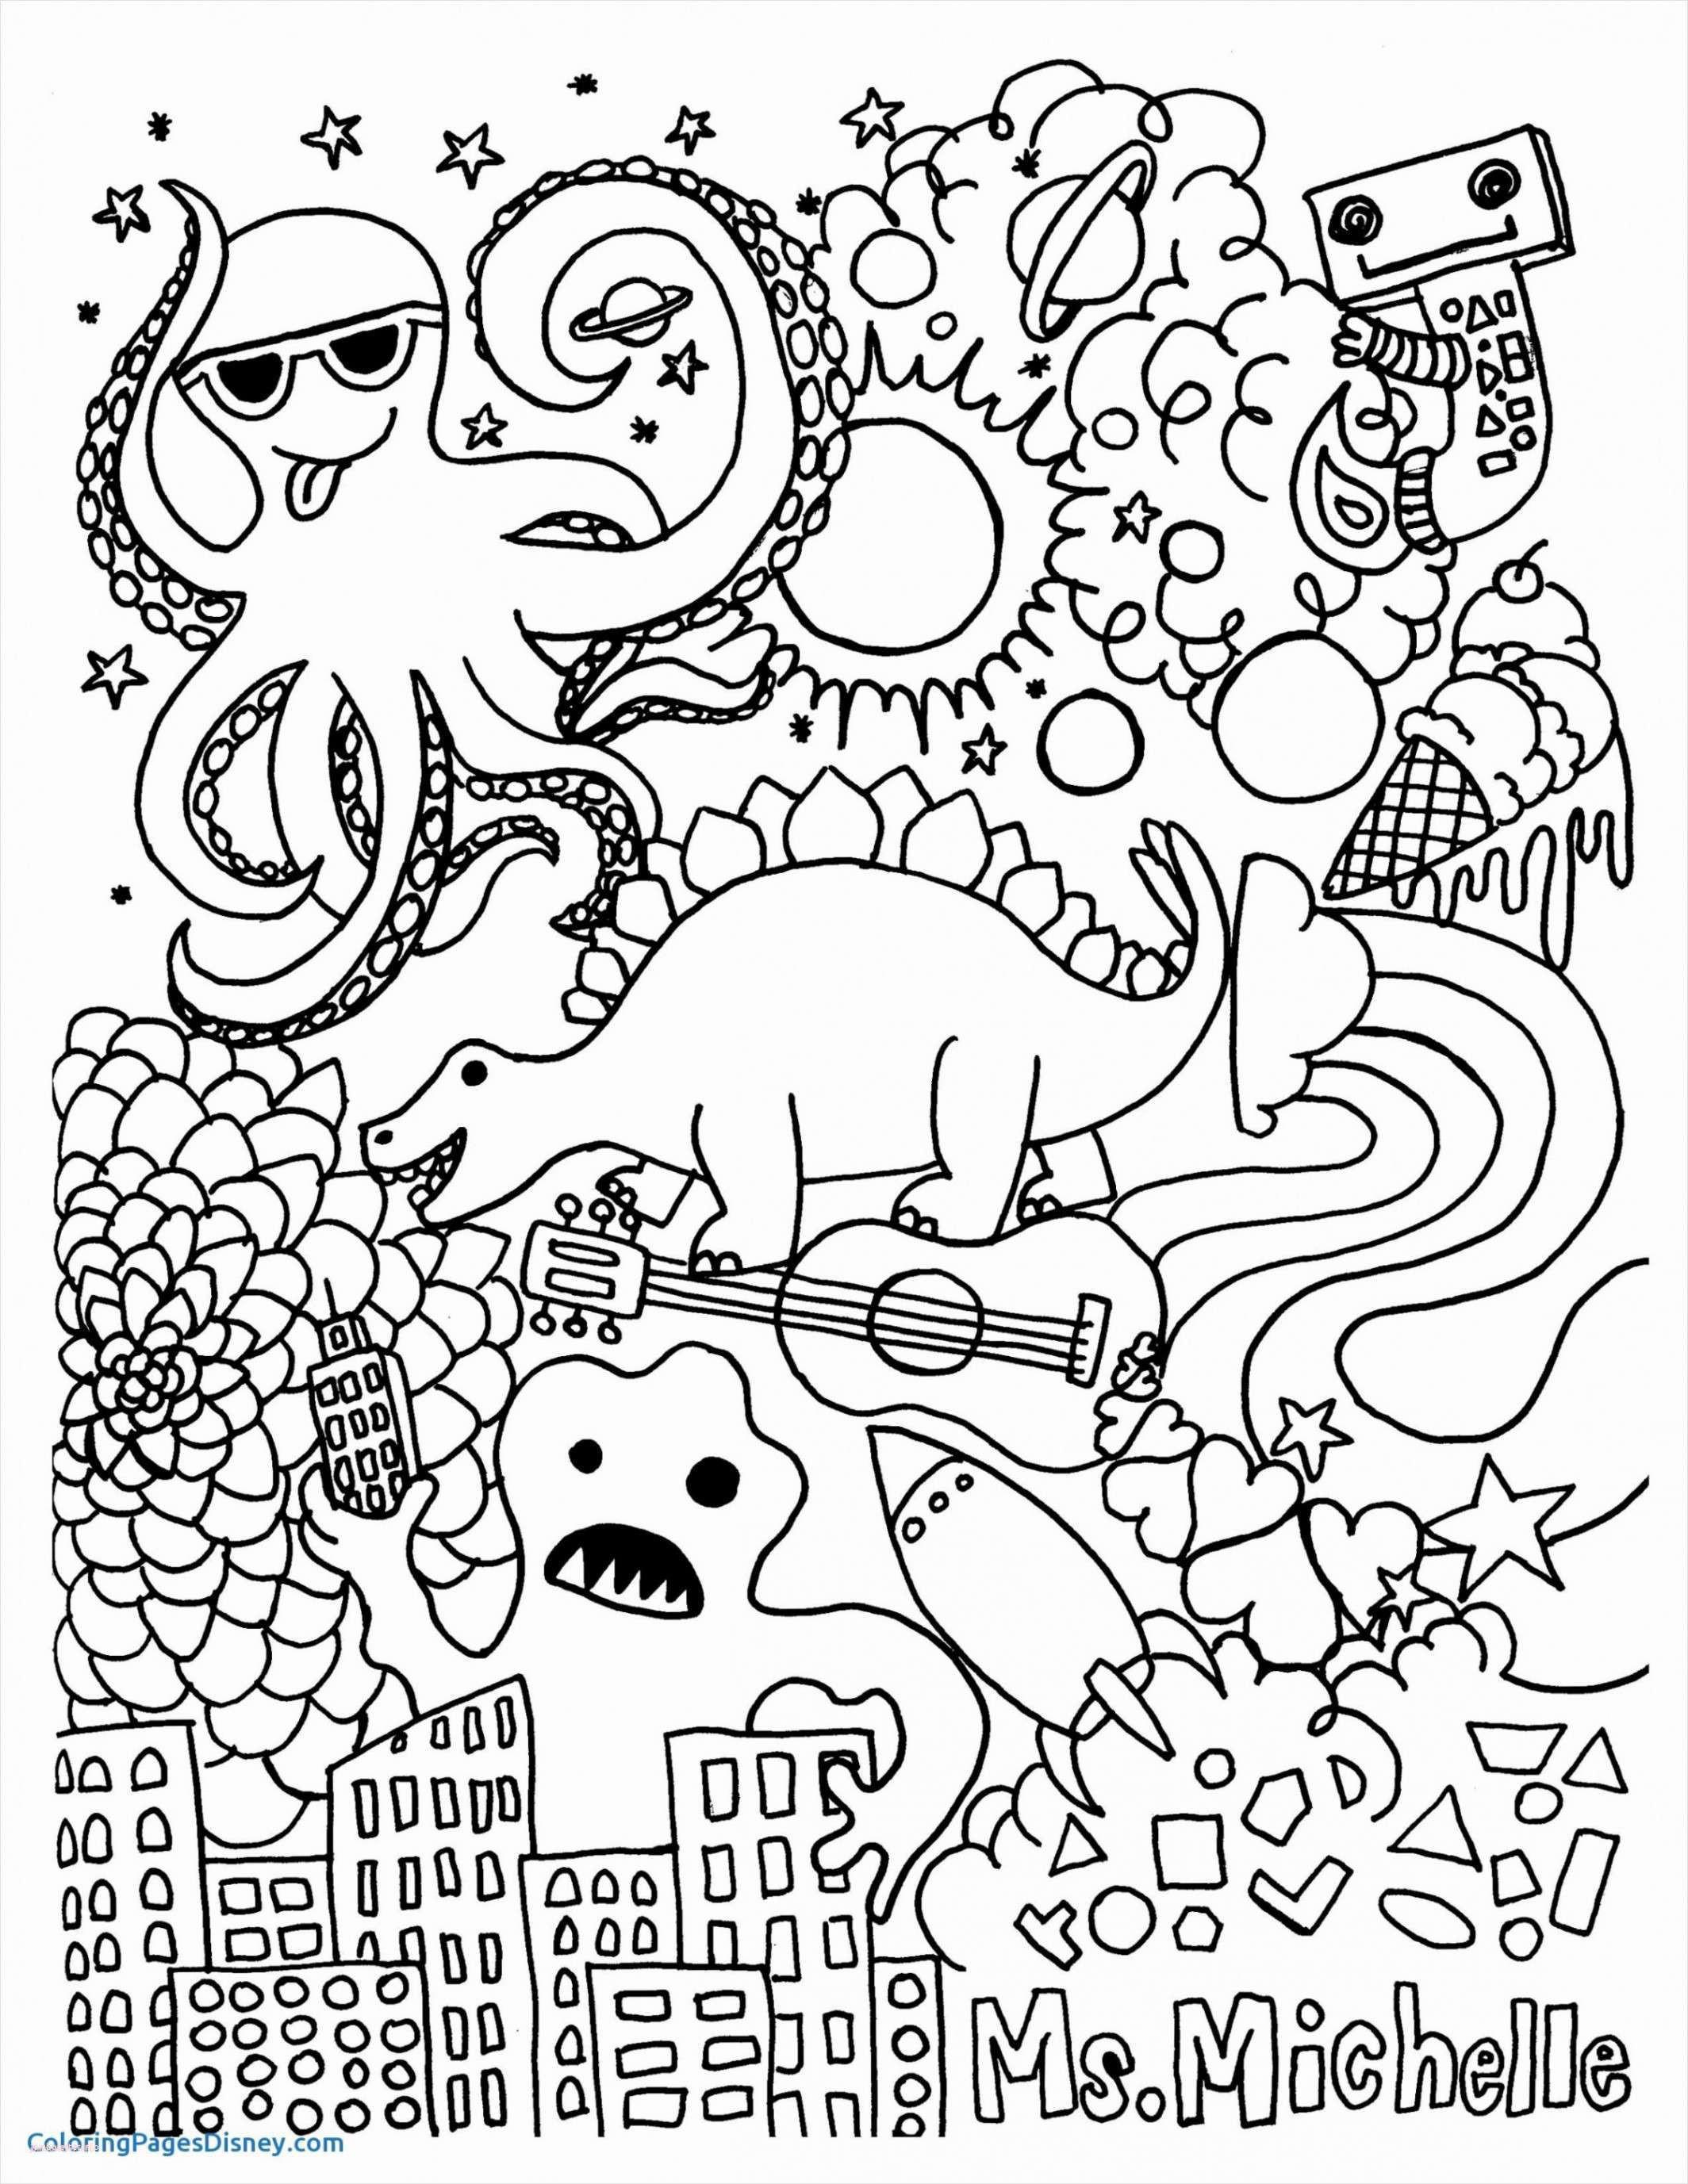 Monster High Ausmalbilder Clawdeen Inspirierend Monster High Ausmalbilder Clawdeen Frisch Clawdeen Wolf Style Frisch Stock